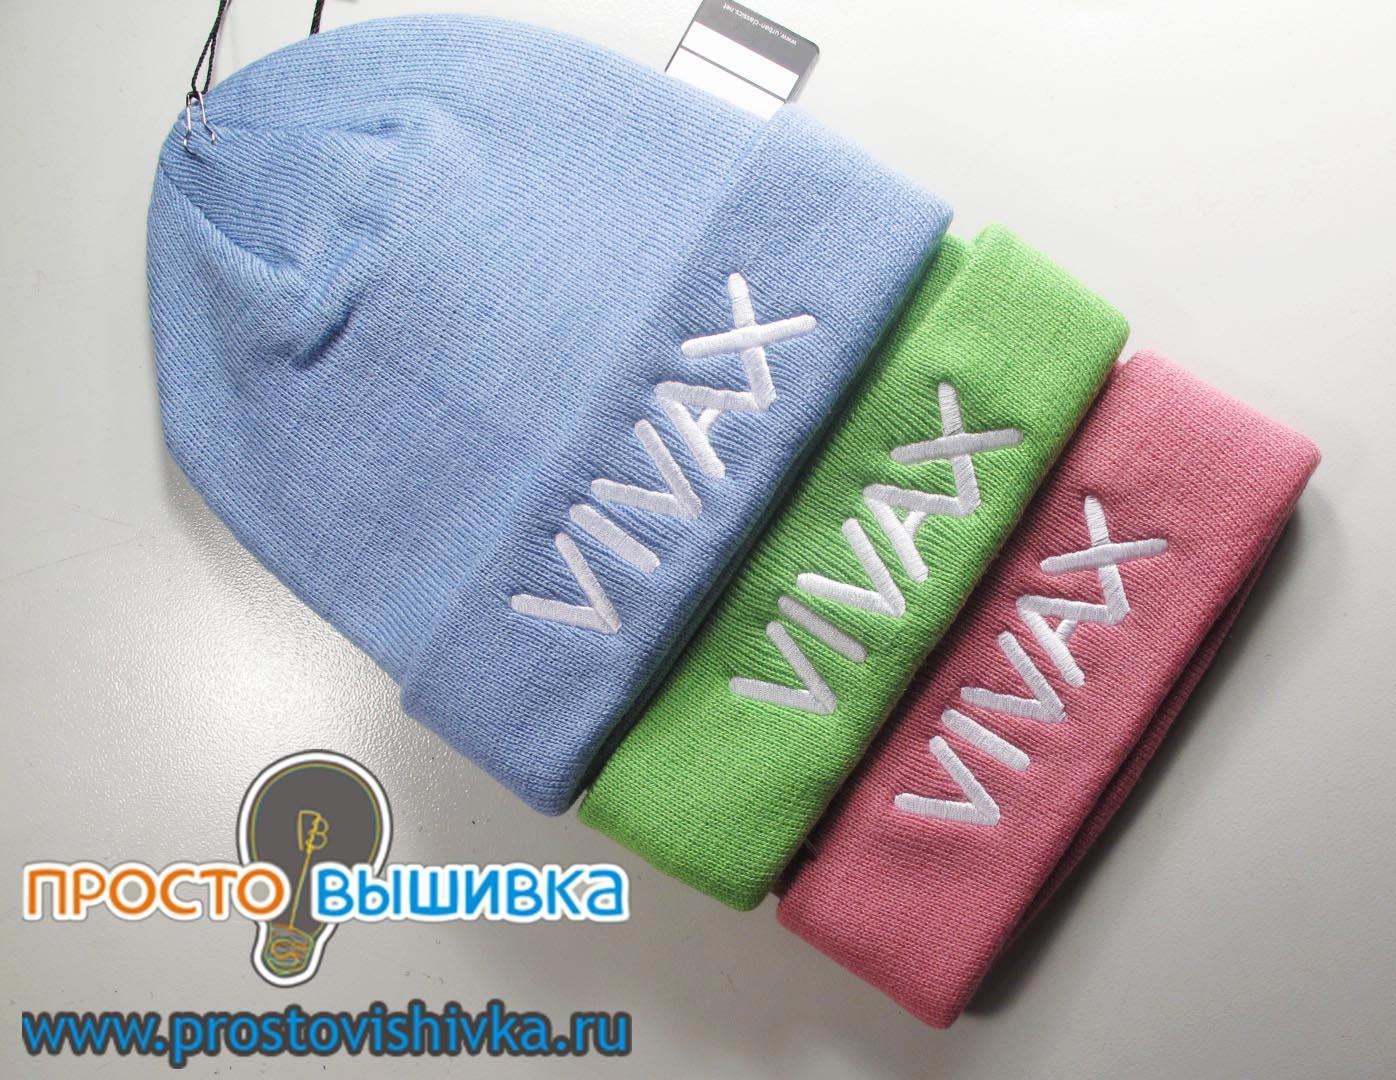 Вышивки на шапках фото